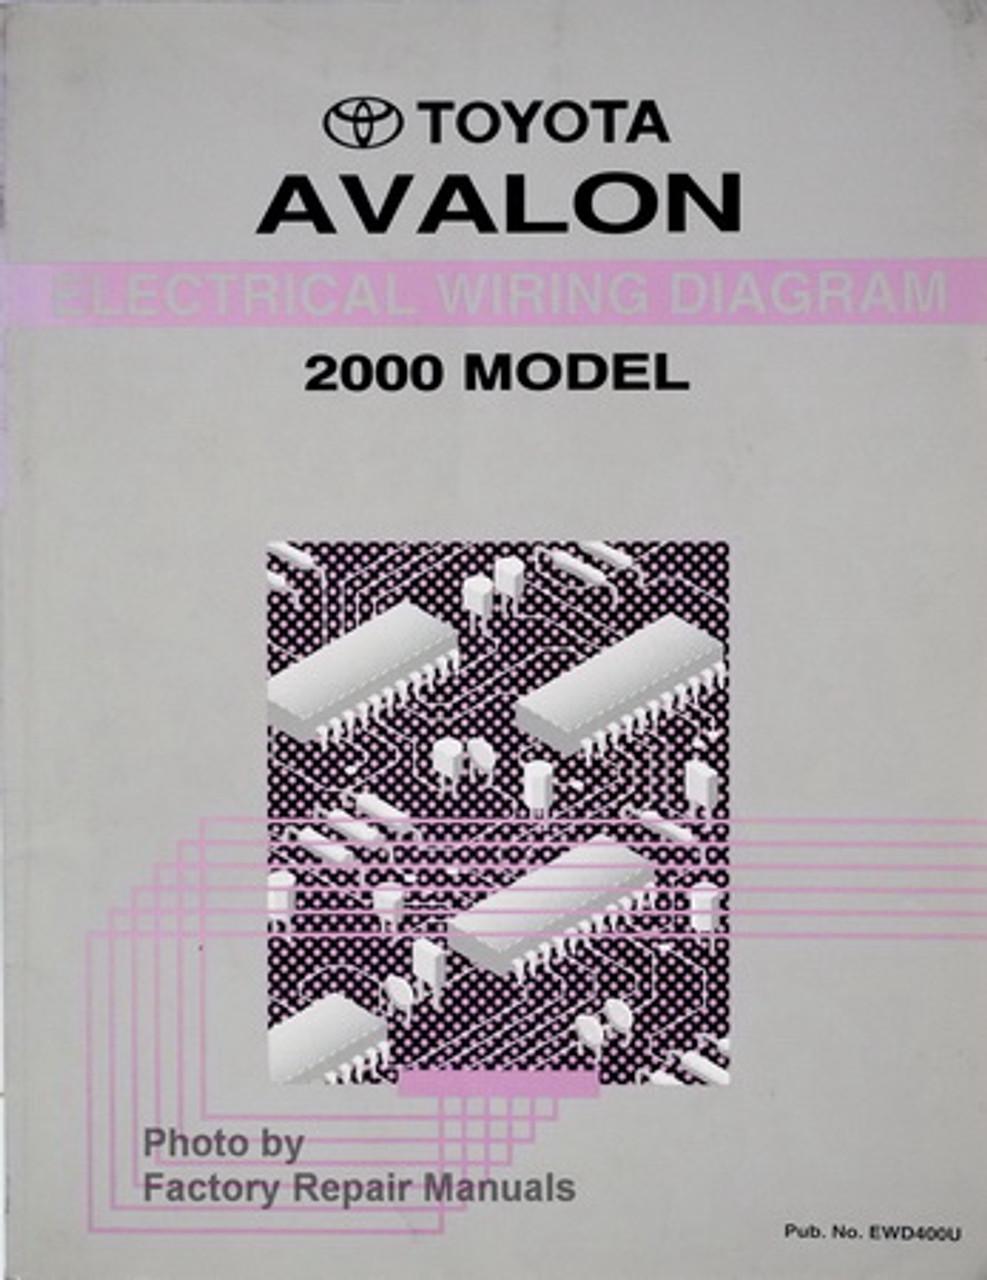 2000 Toyota Avalon Electrical Wiring Diagrams Original